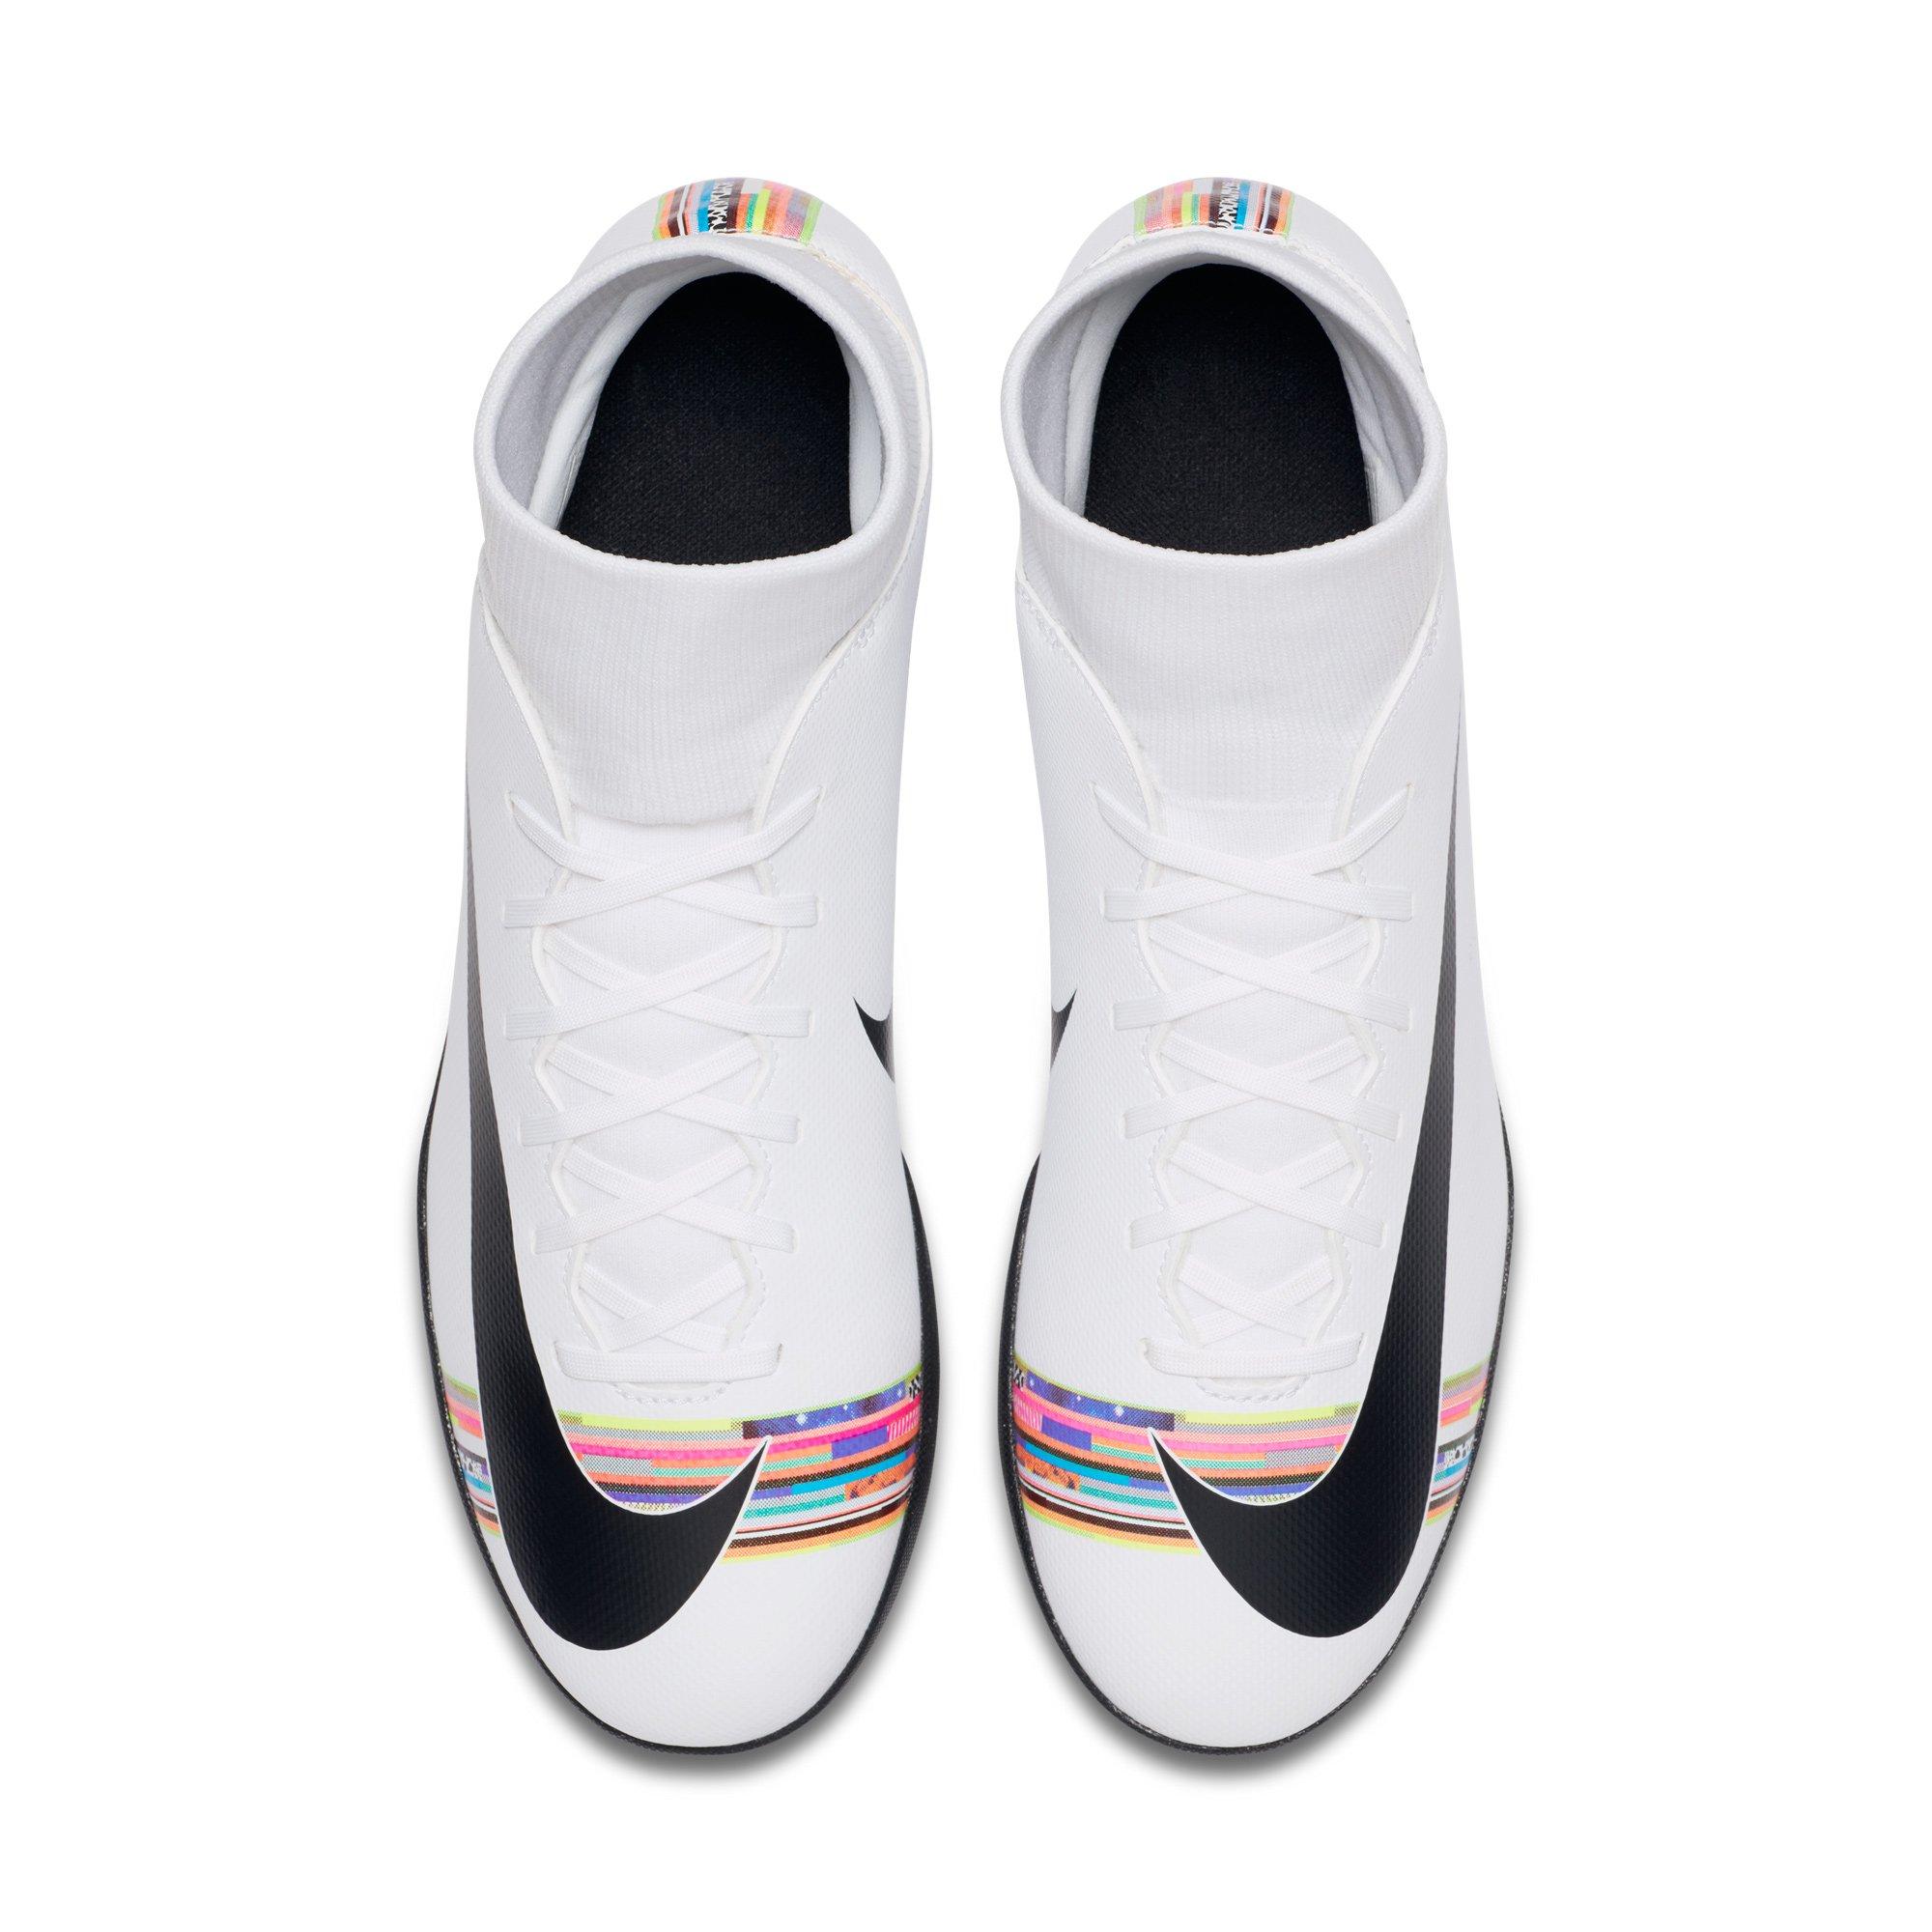 Chuteira Society Nike Mercurial Superfly 6 Club CR7 TF Branco e Preto